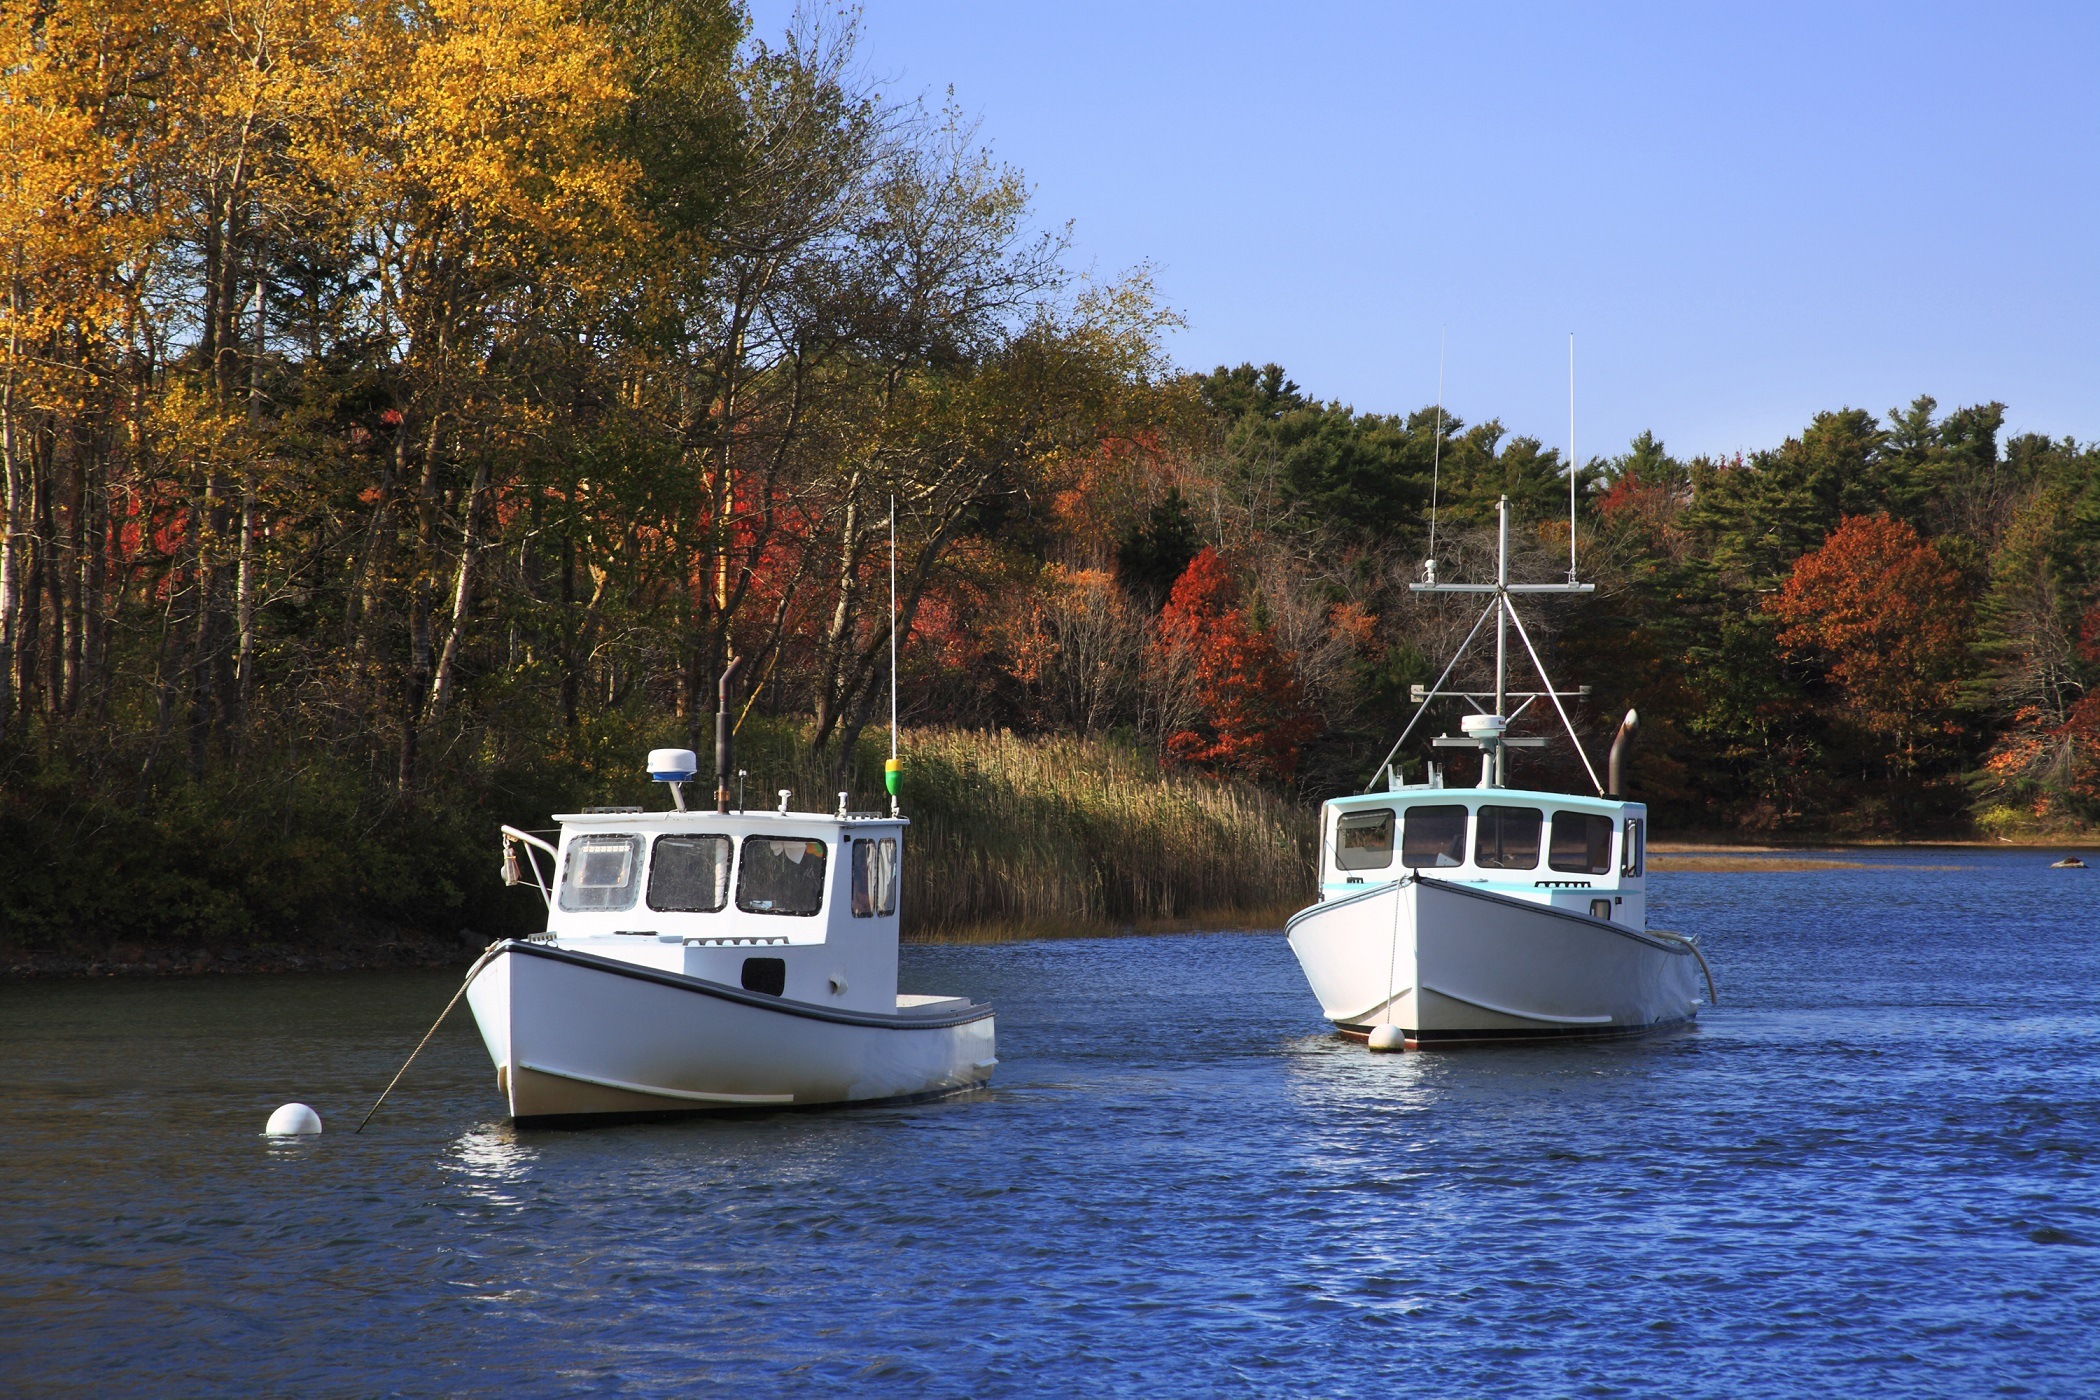 Kennebunkport Harbor, Maine